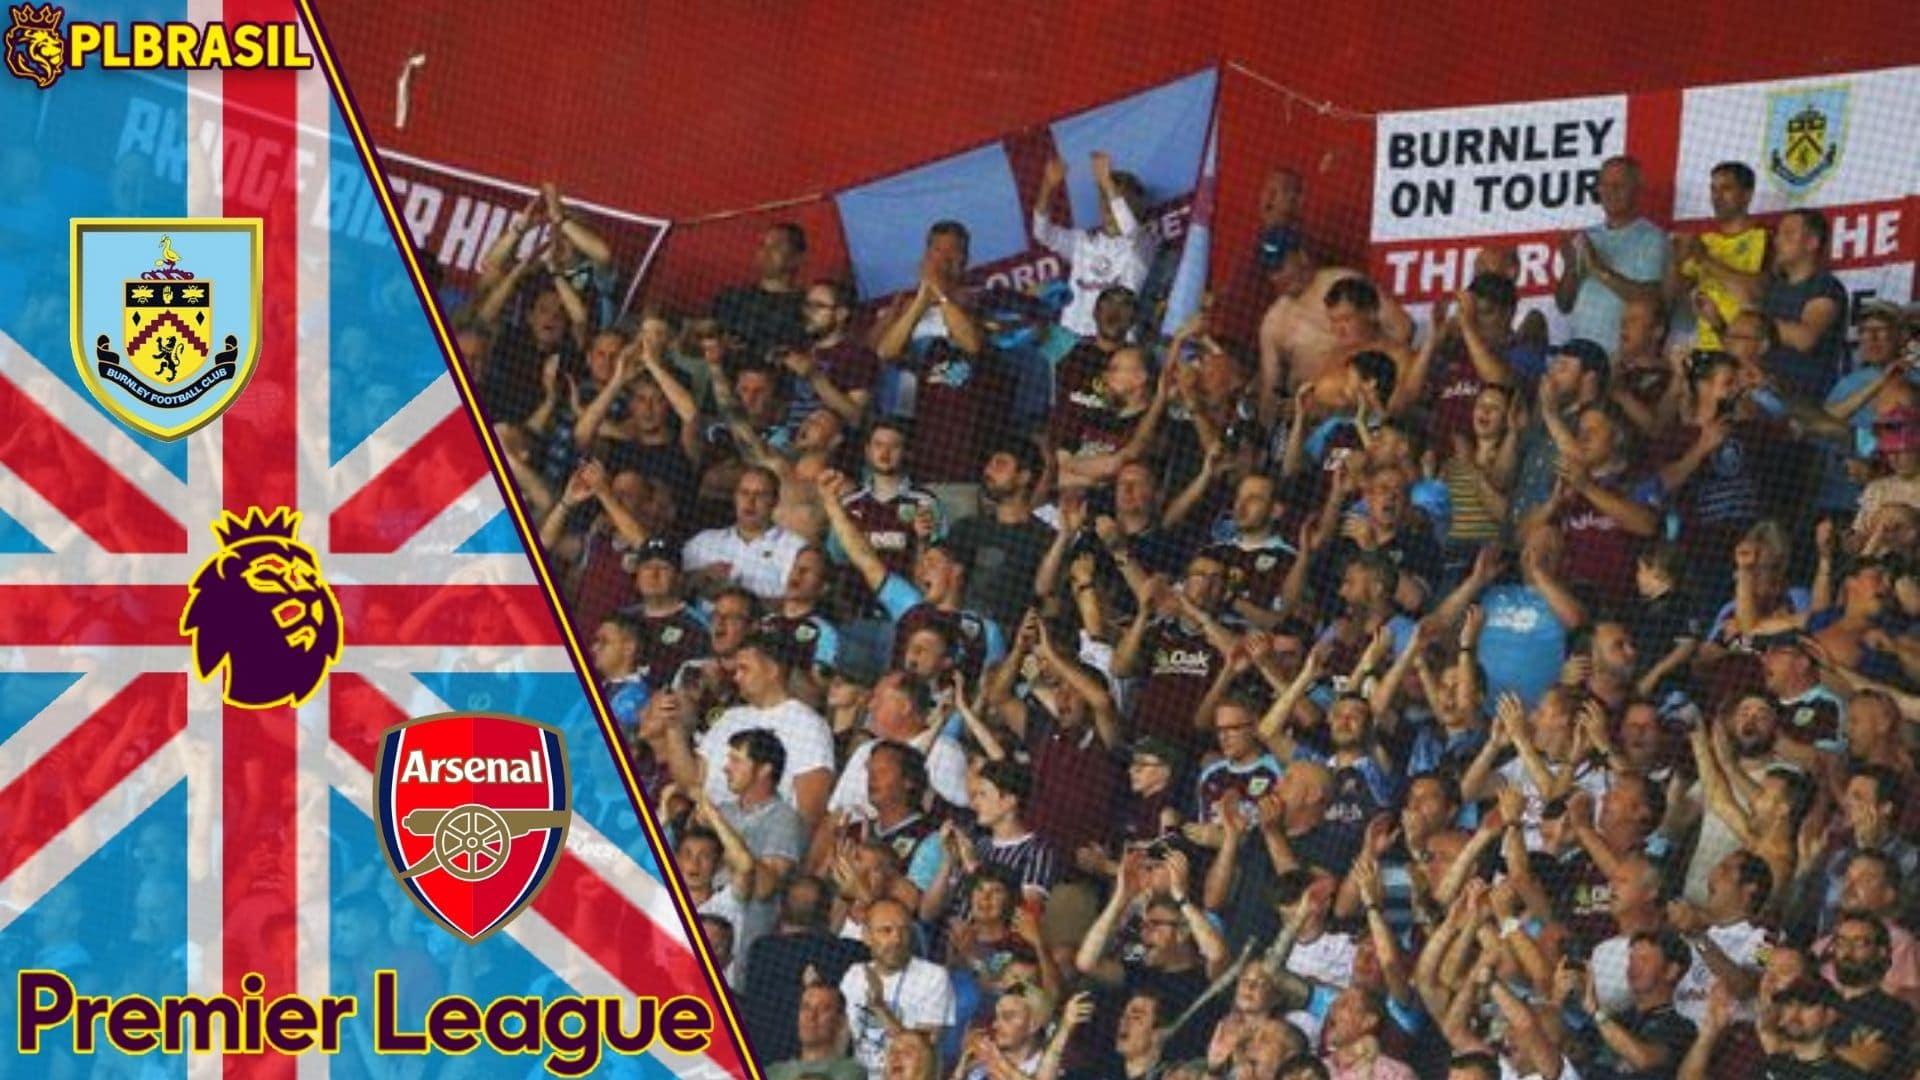 Palpite & Prognóstico - Burnley x Arsenal